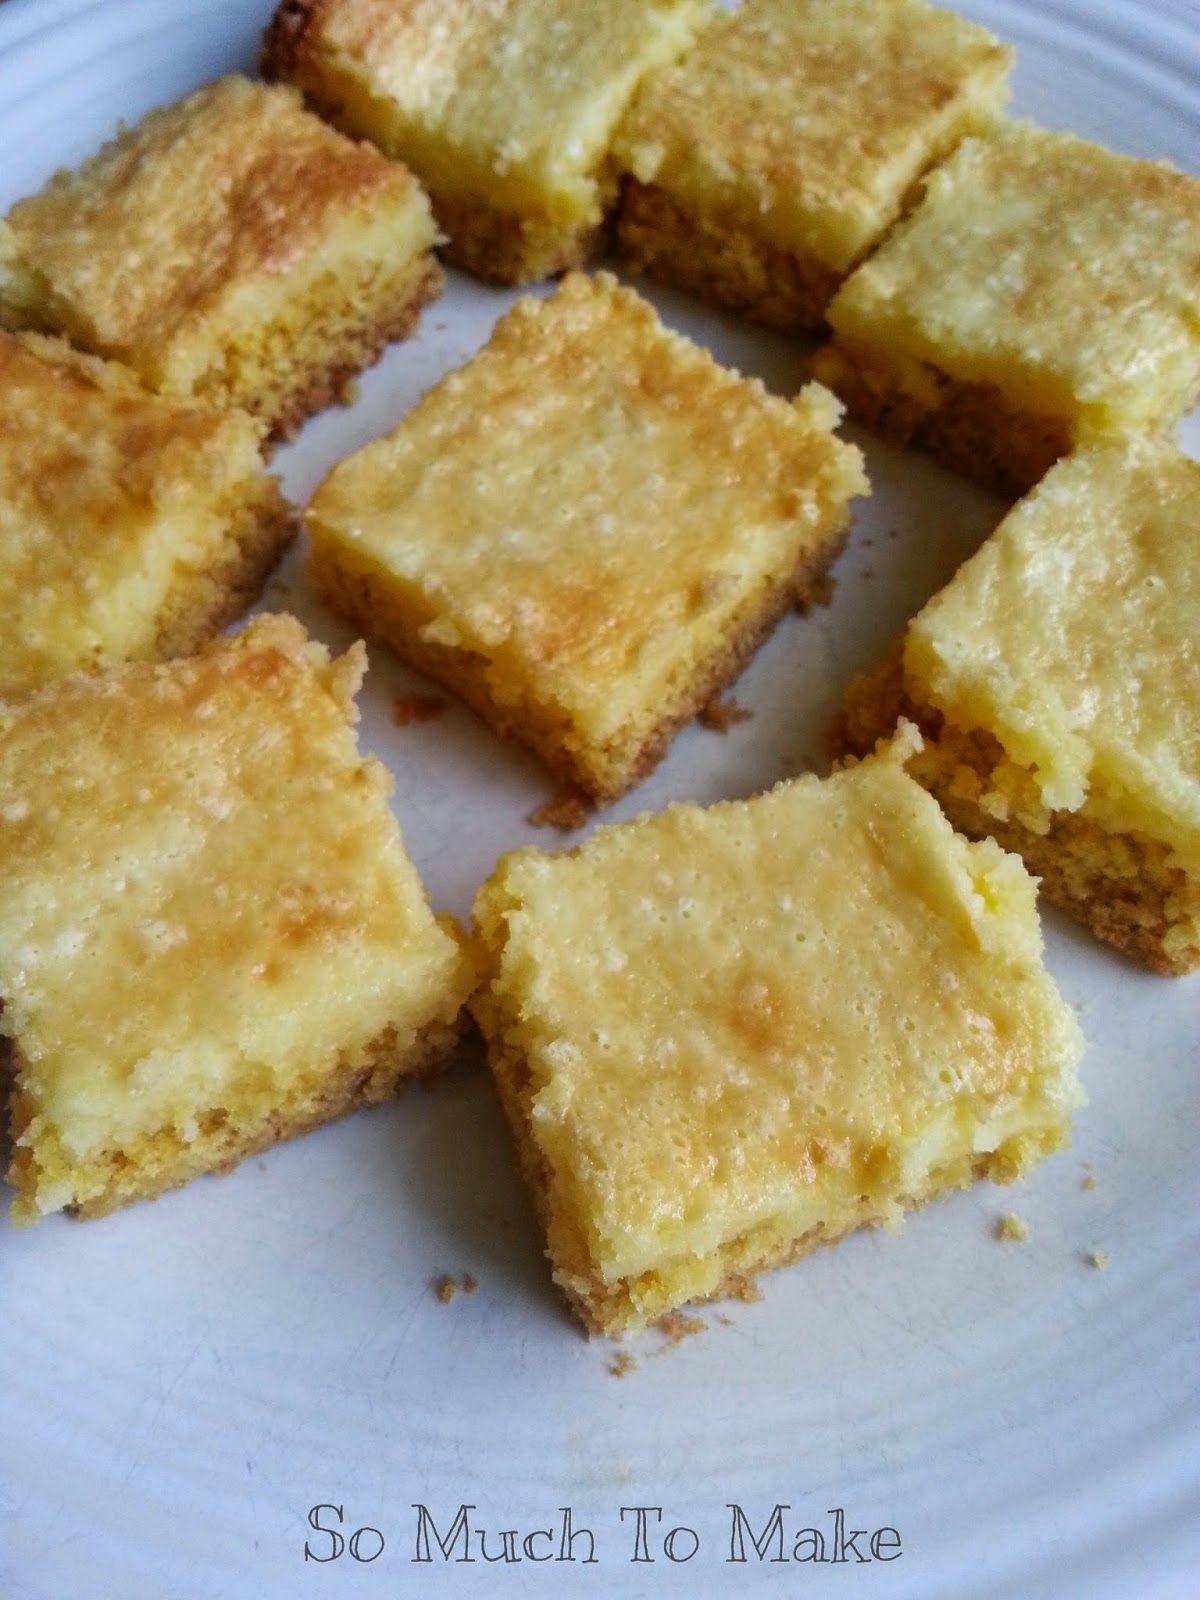 Lemon Cake From Yellow Cake Mix